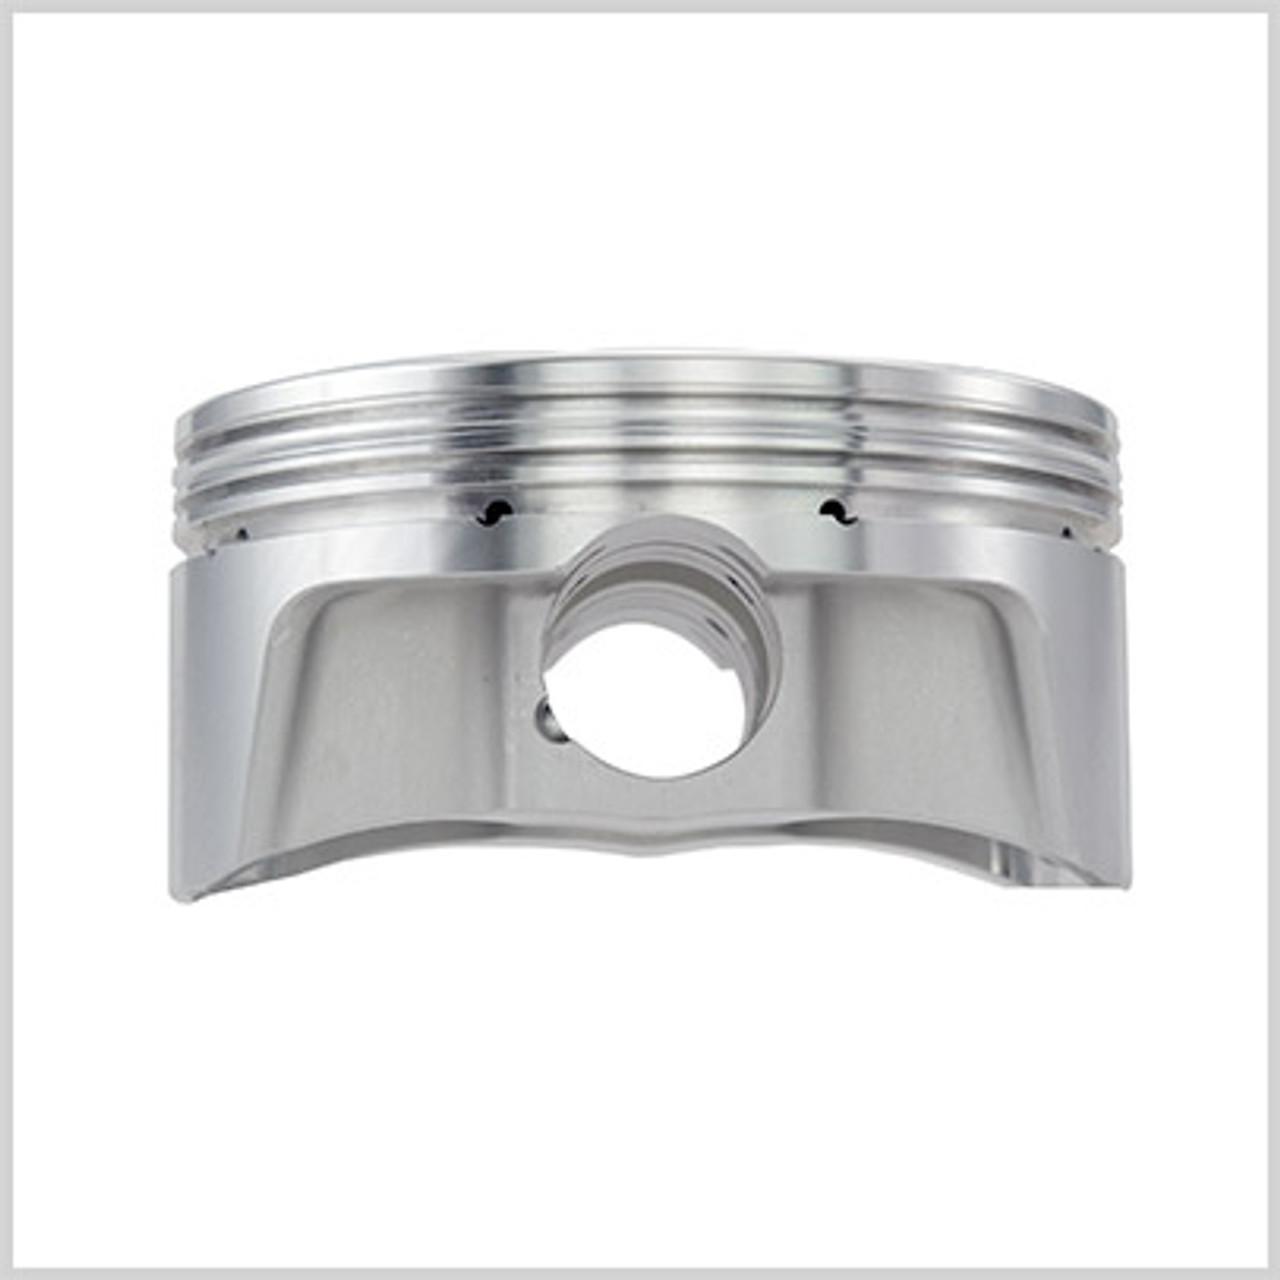 "Carillo CP Bullet LS 4.030"" Pistons Set | 4.00"" Stroke -8cc Dish Top | POWER ADDER"